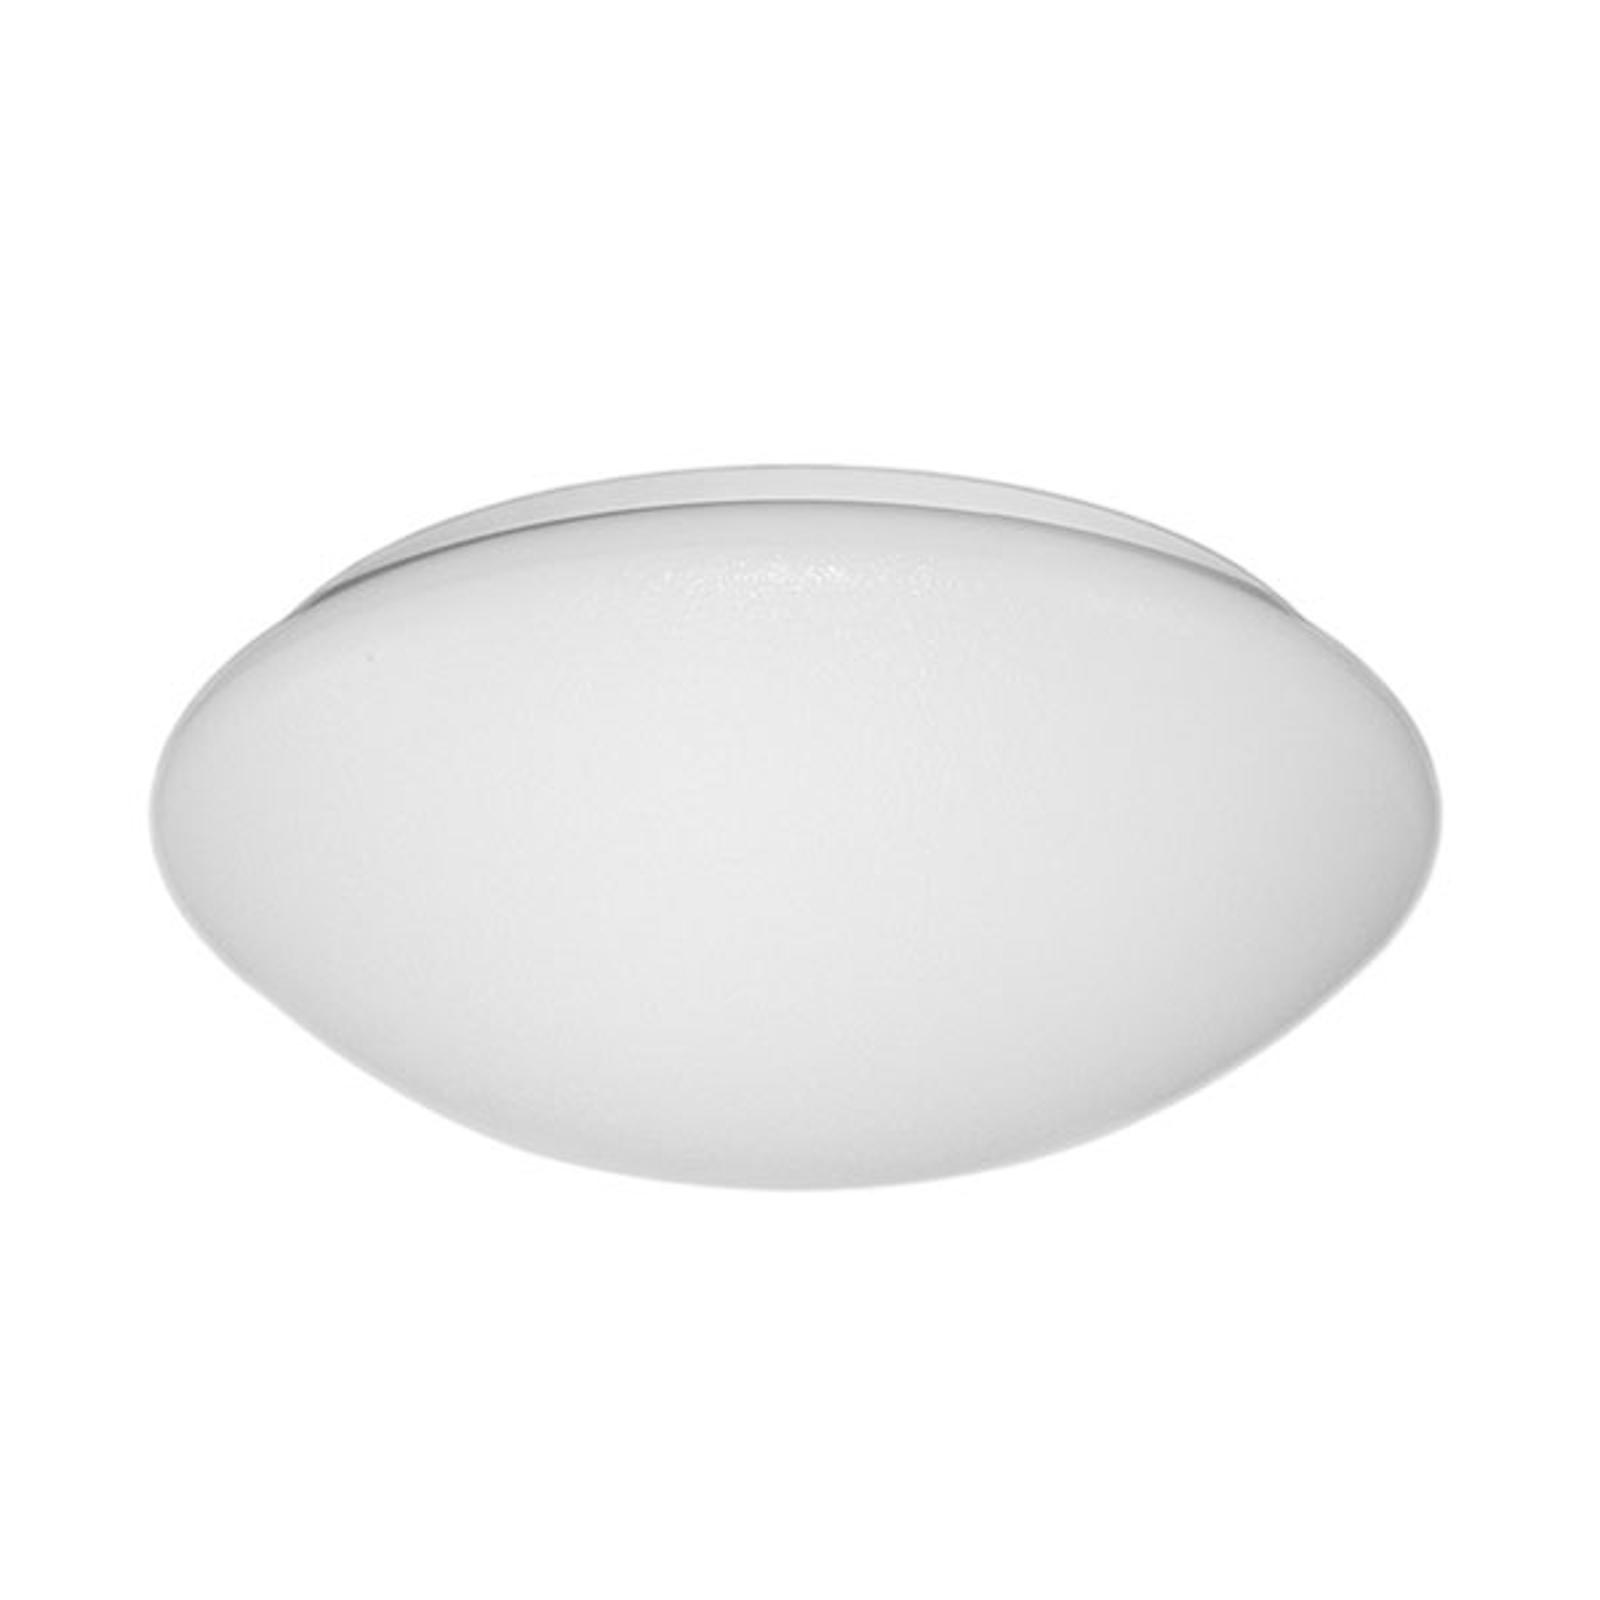 Lampa sufitowa LED, odporna, 27W, 3000 K